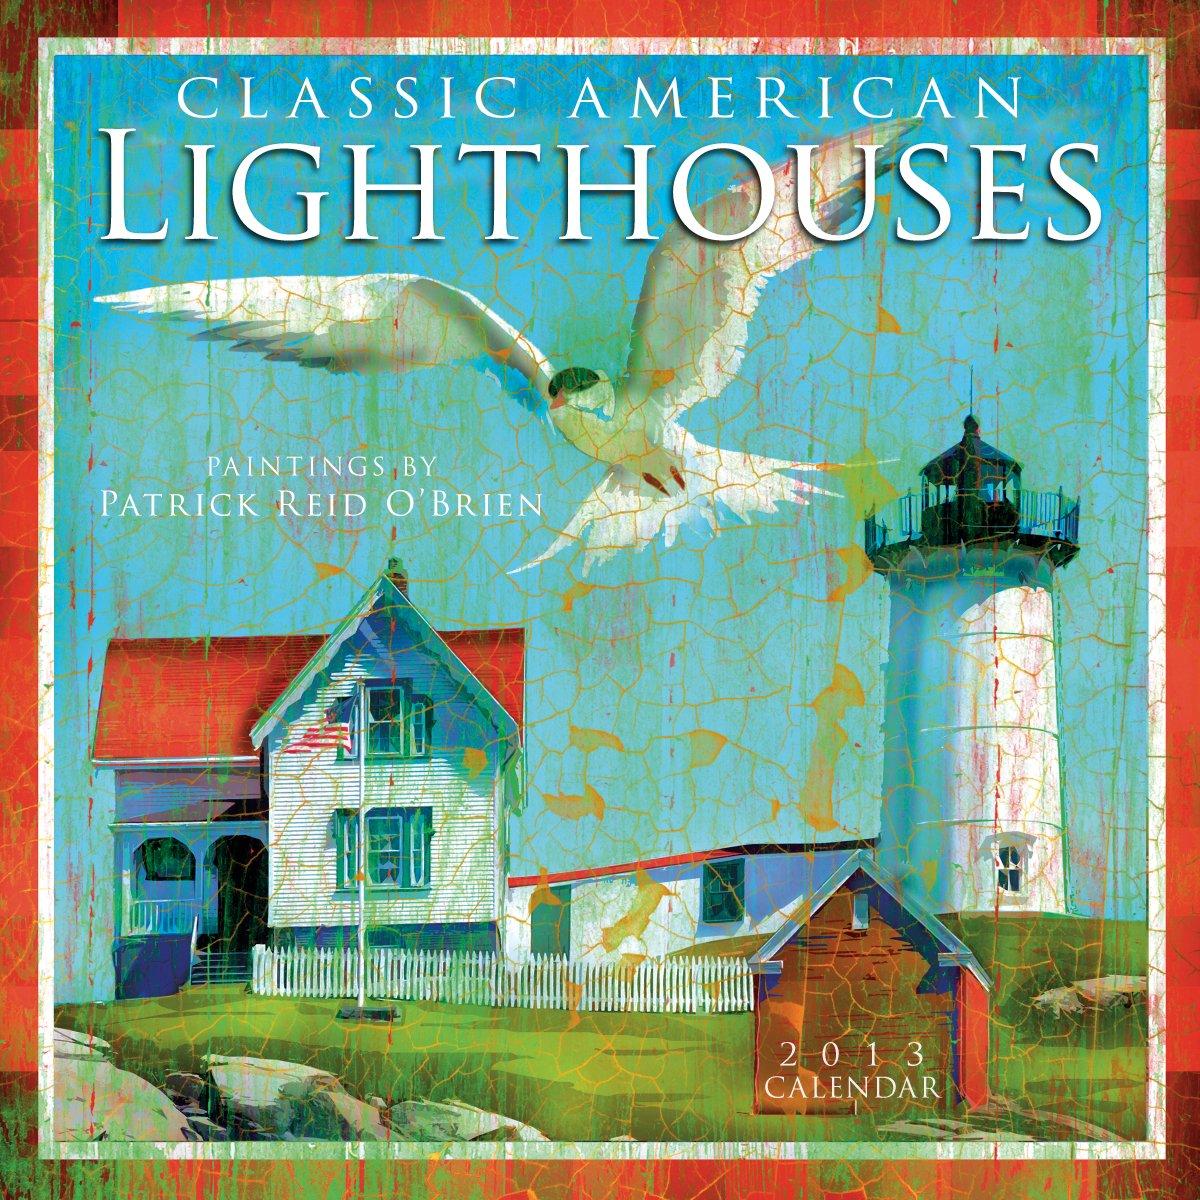 2012 lighthouses wall calendar